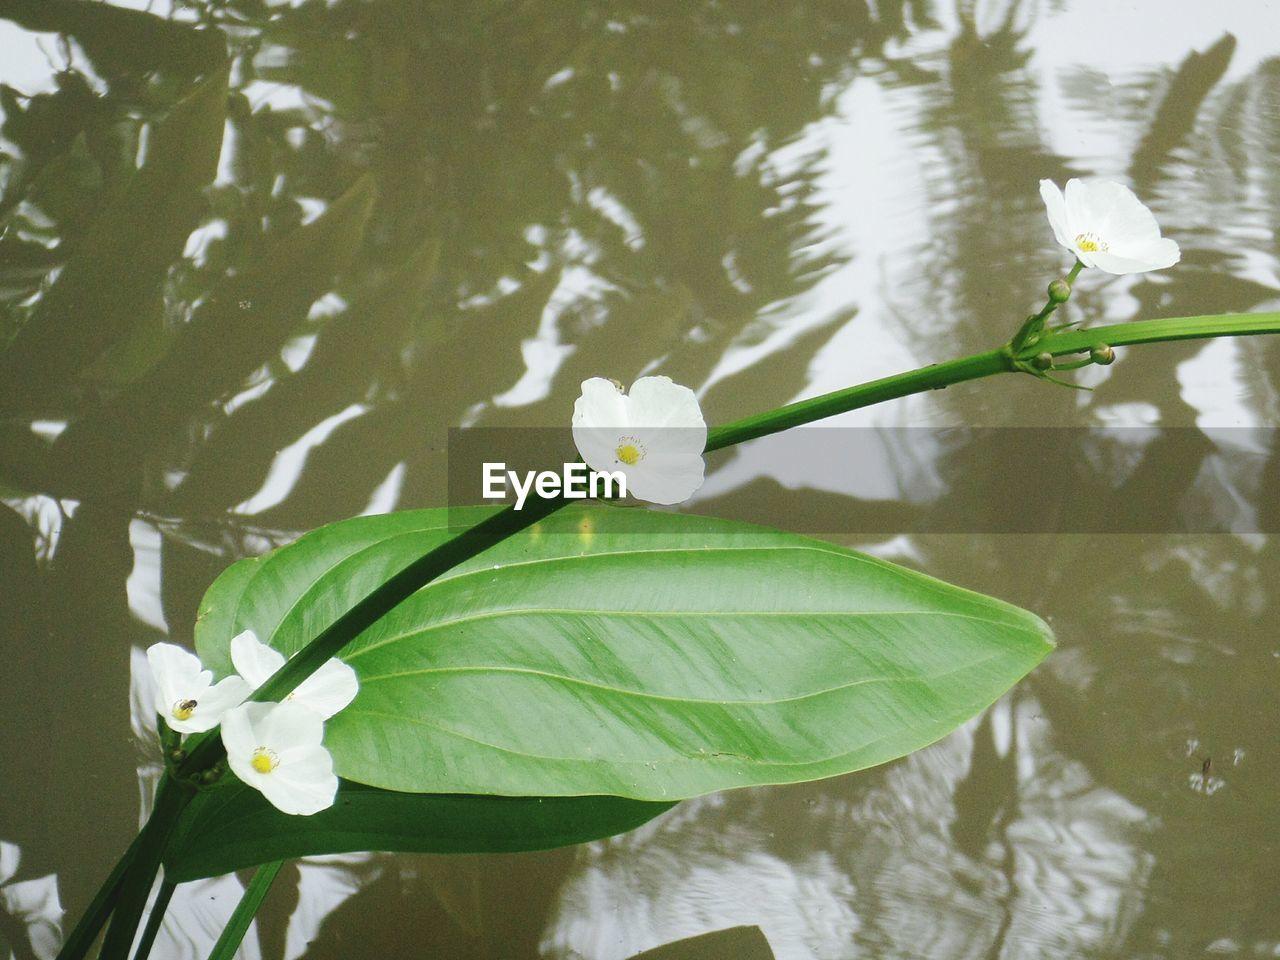 CLOSE-UP OF WHITE ROSE FLOATING ON LAKE